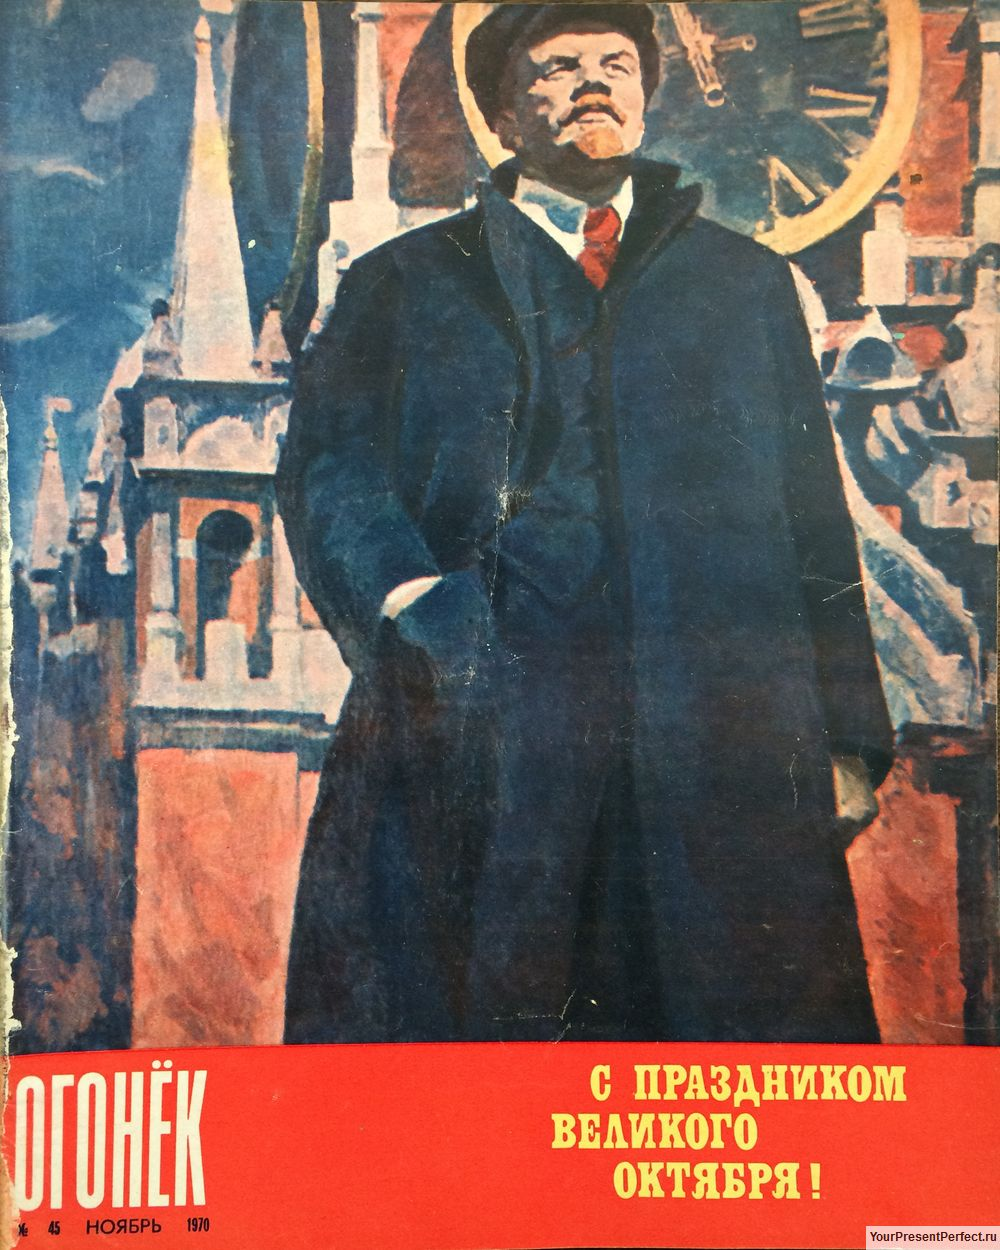 Журнал Огонек №45 ноябрь 1970